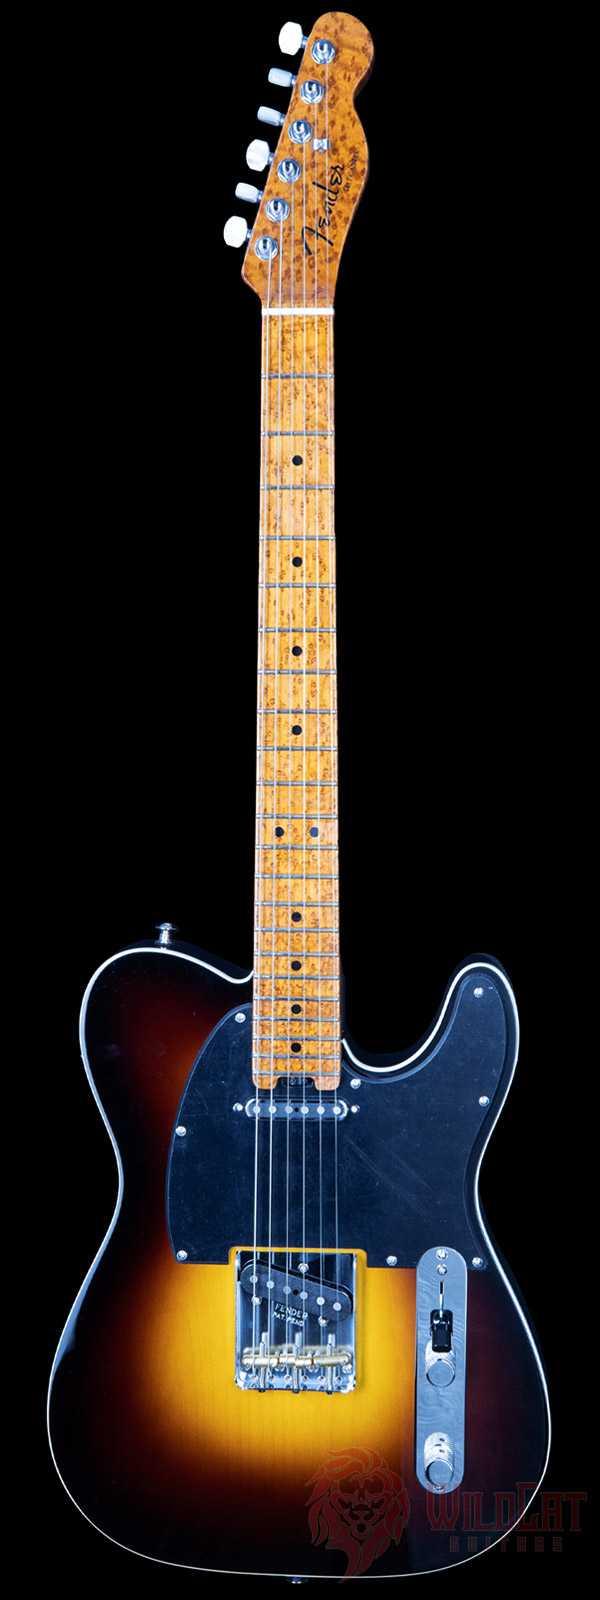 Fender Custom Shop LTD Elite Telecaster Roasted Birdseye Neck Wide Fade 2-Tone Sunburst NOS